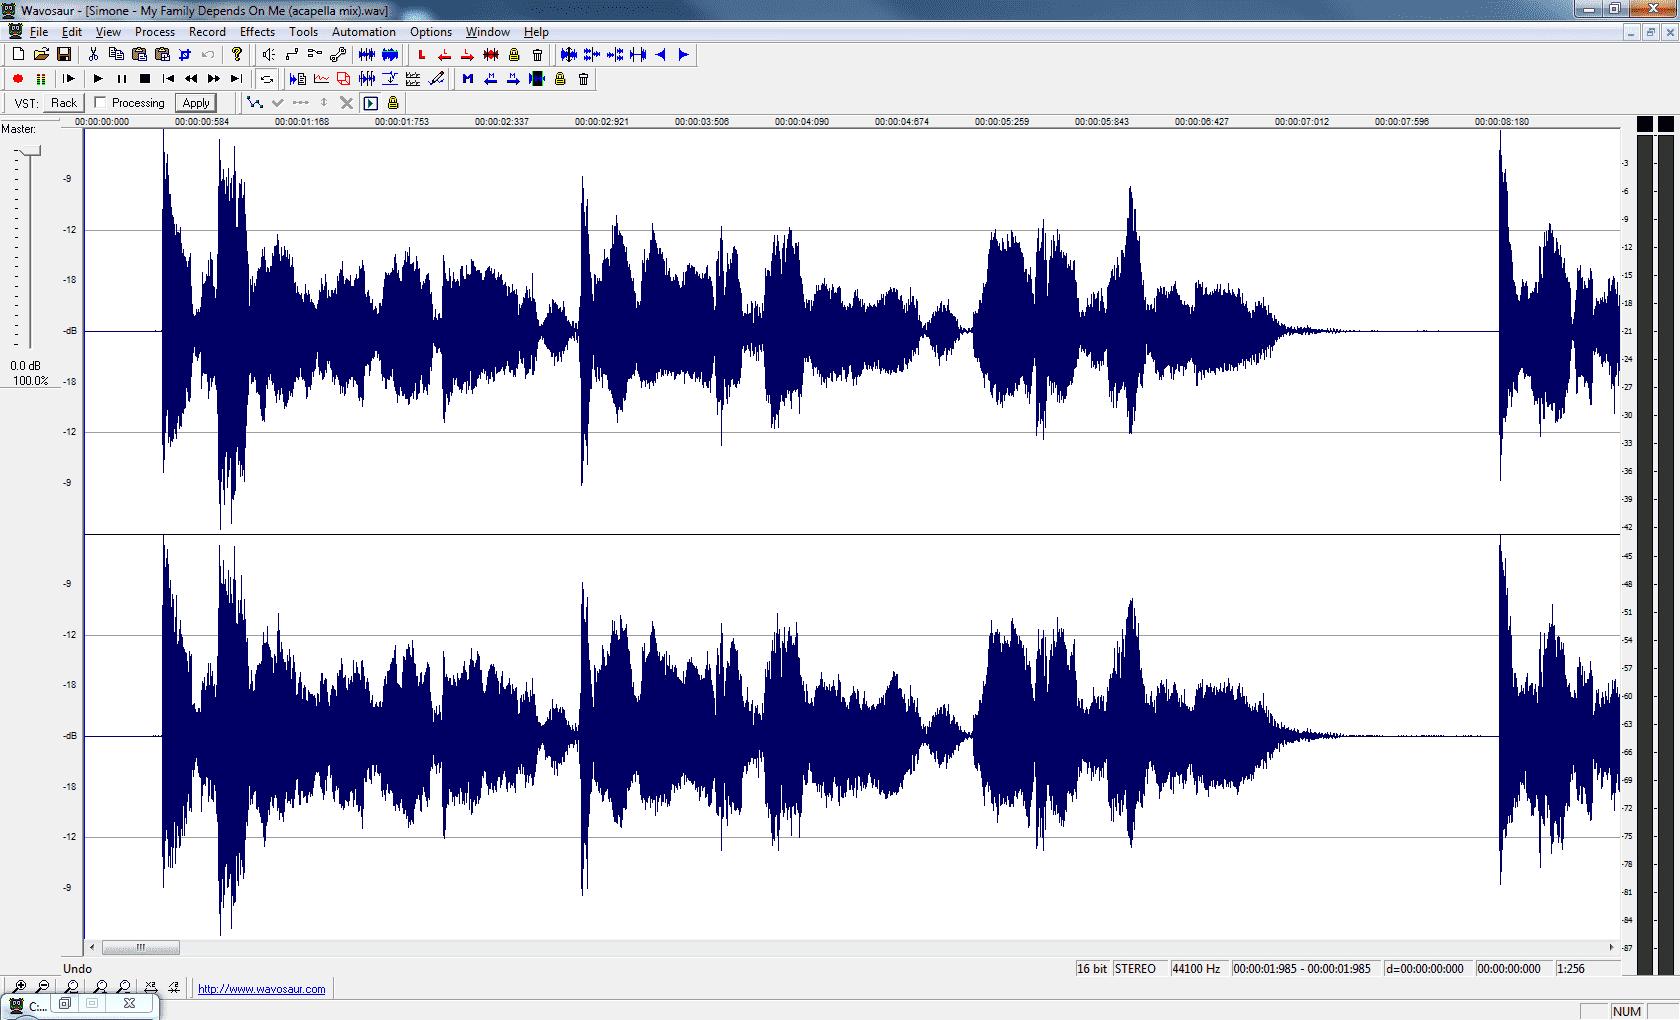 Blogosaur | Audio Edition, Music, VST & Wavosaur 4 all the